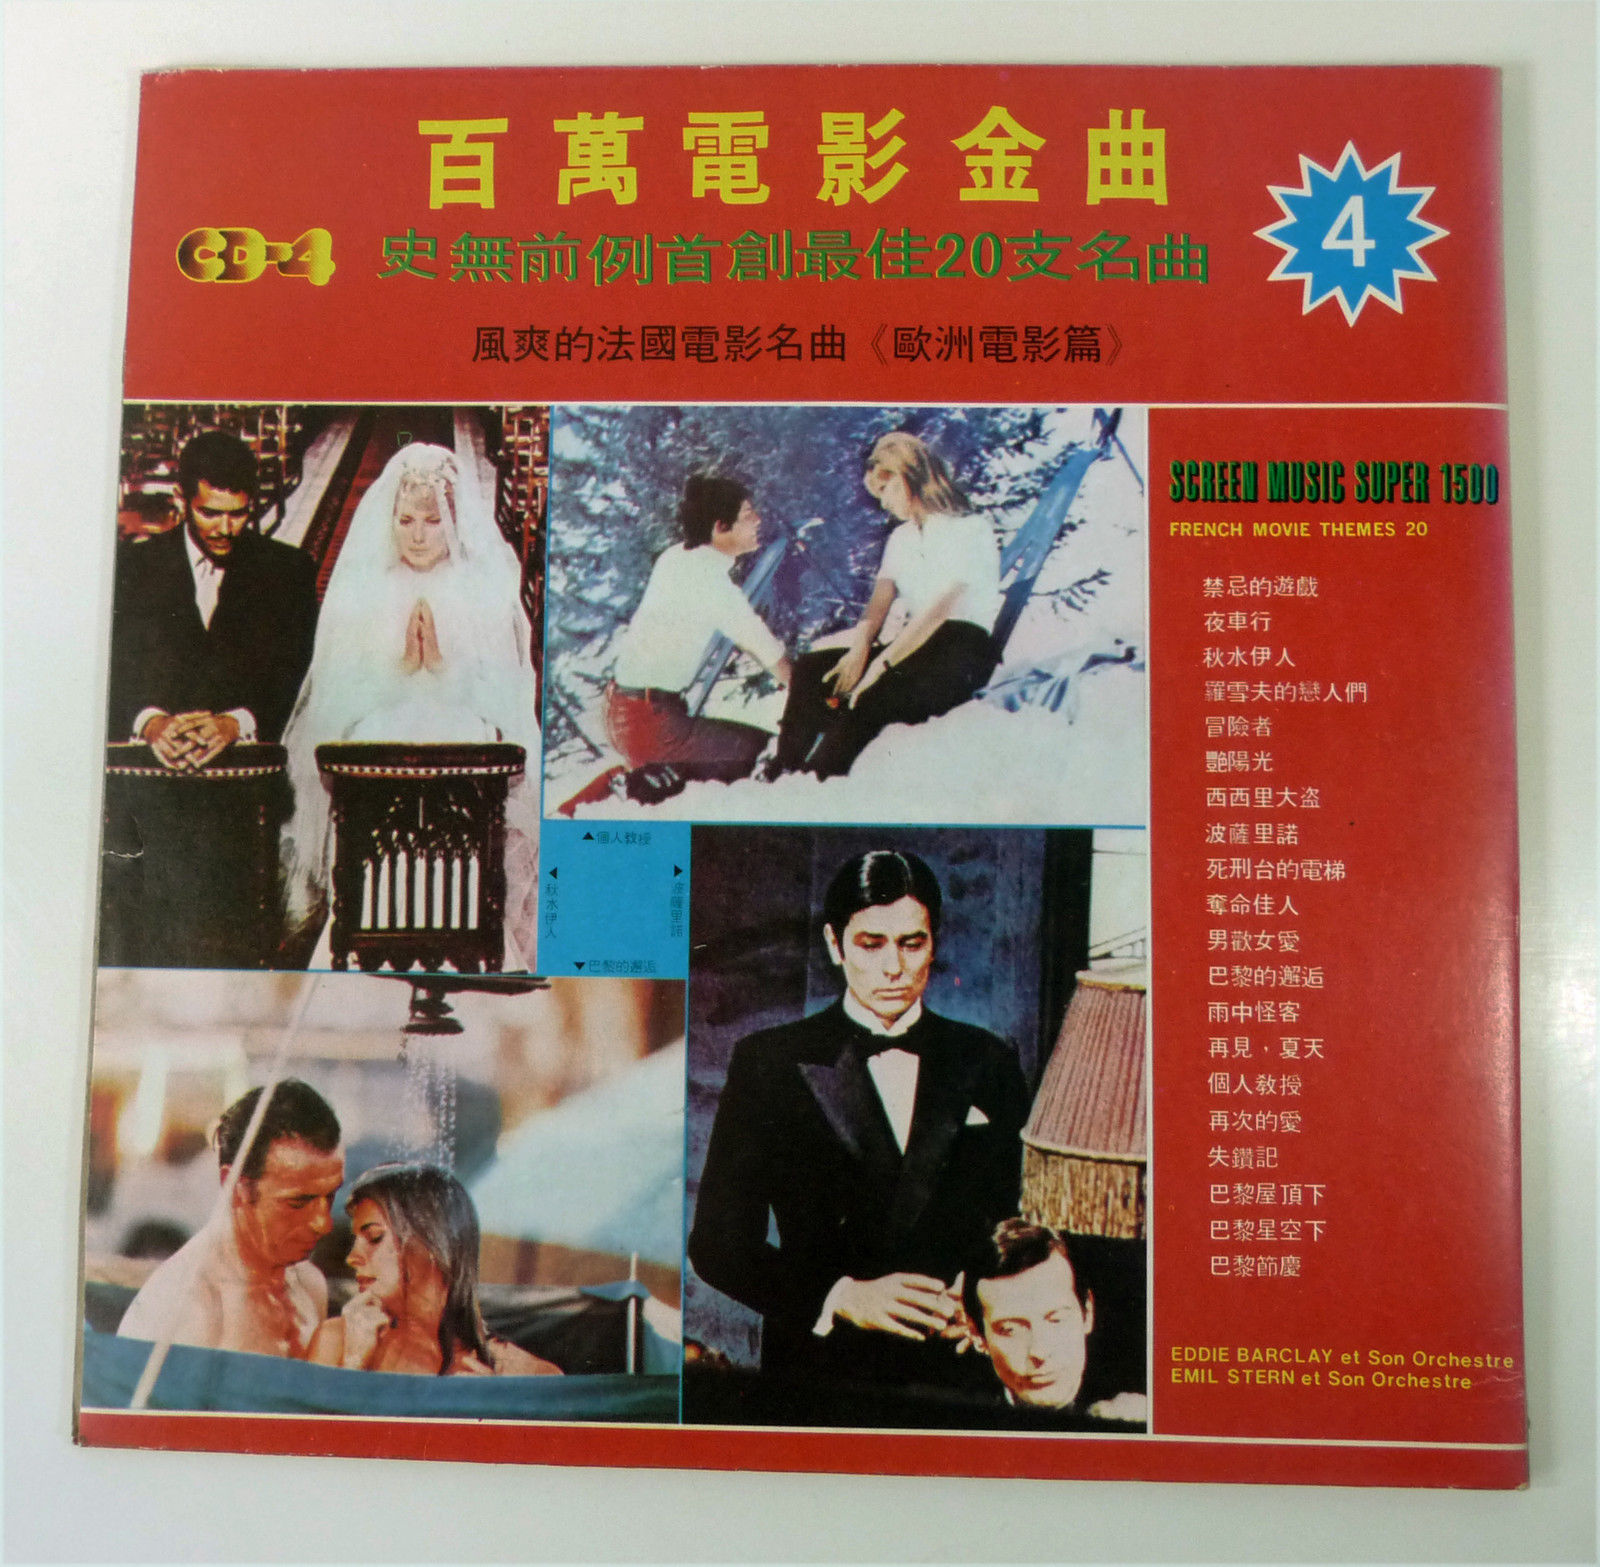 Screen Music Super 1500, French Movie Themes 20.  Music World SSA-5004 (CD4) [Taiwan]b.jpg